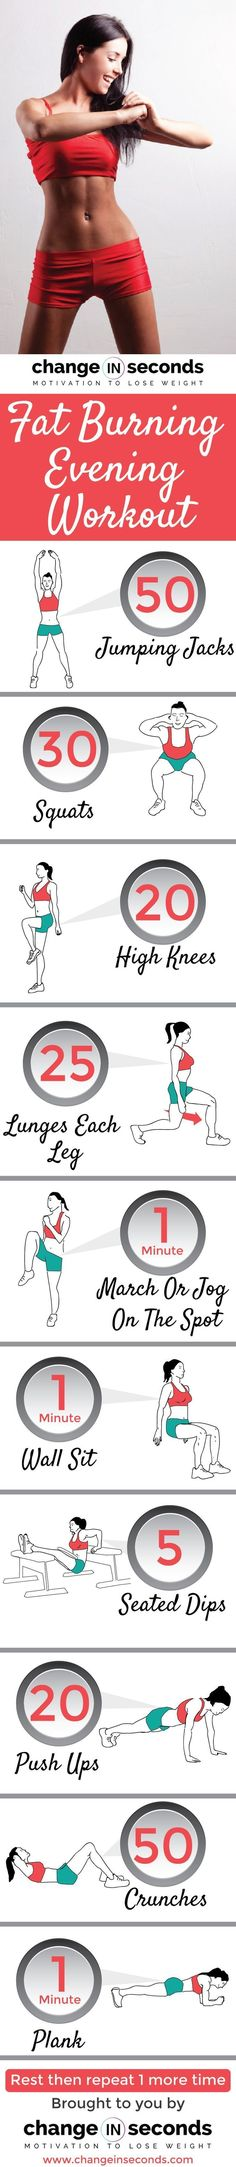 Fat Burning Evening Workout #motivation